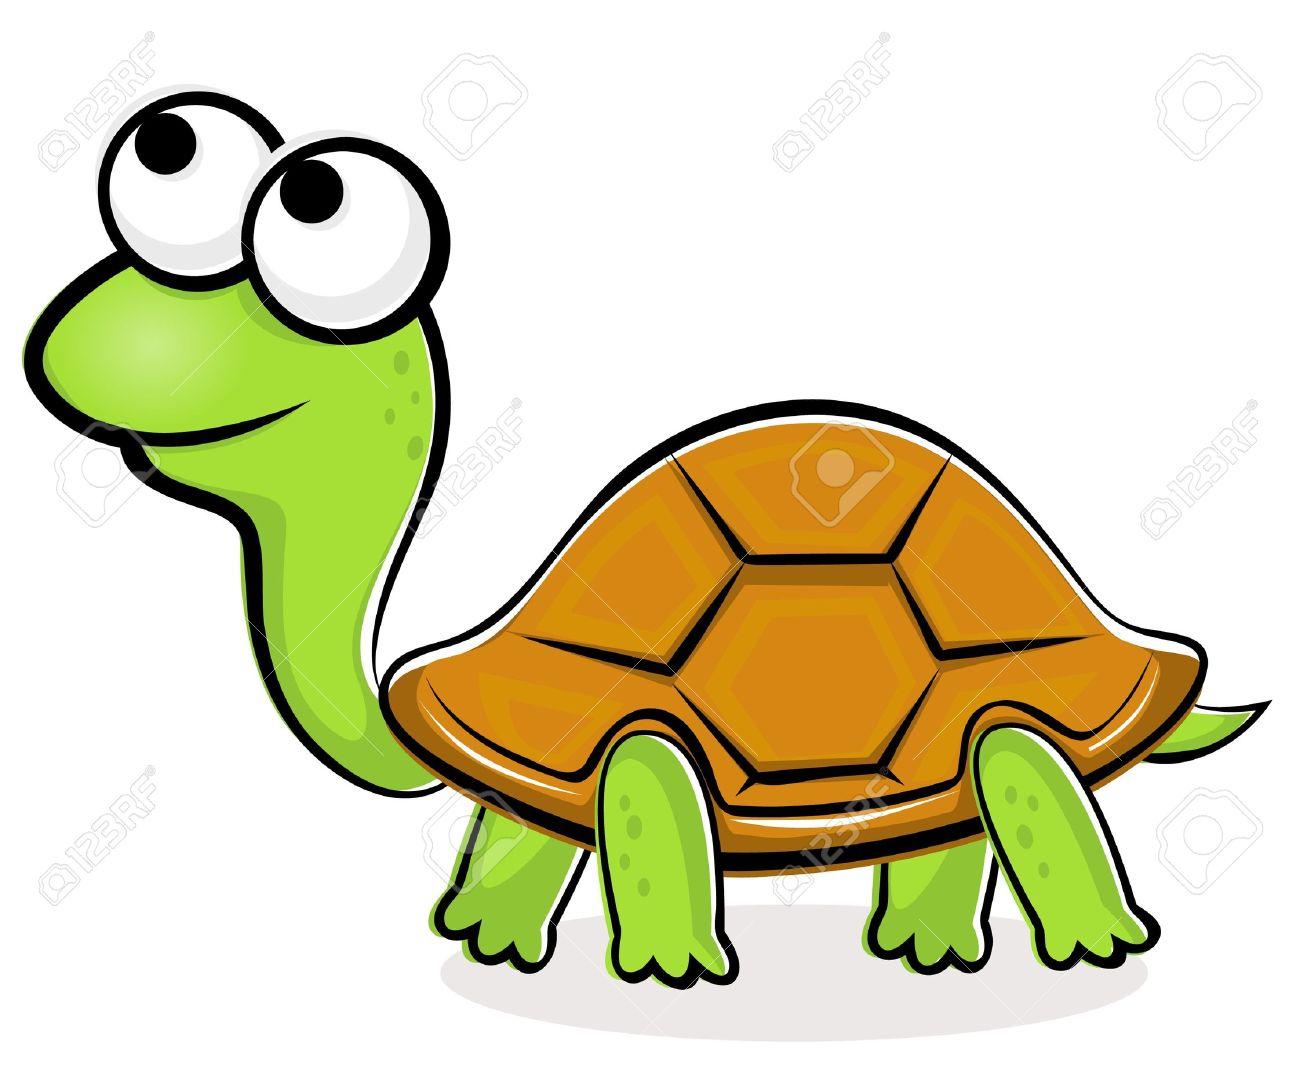 tortoise clipart clipart panda free clipart images rh clipartpanda com tortoise clipart silhouette tortoise clipart free